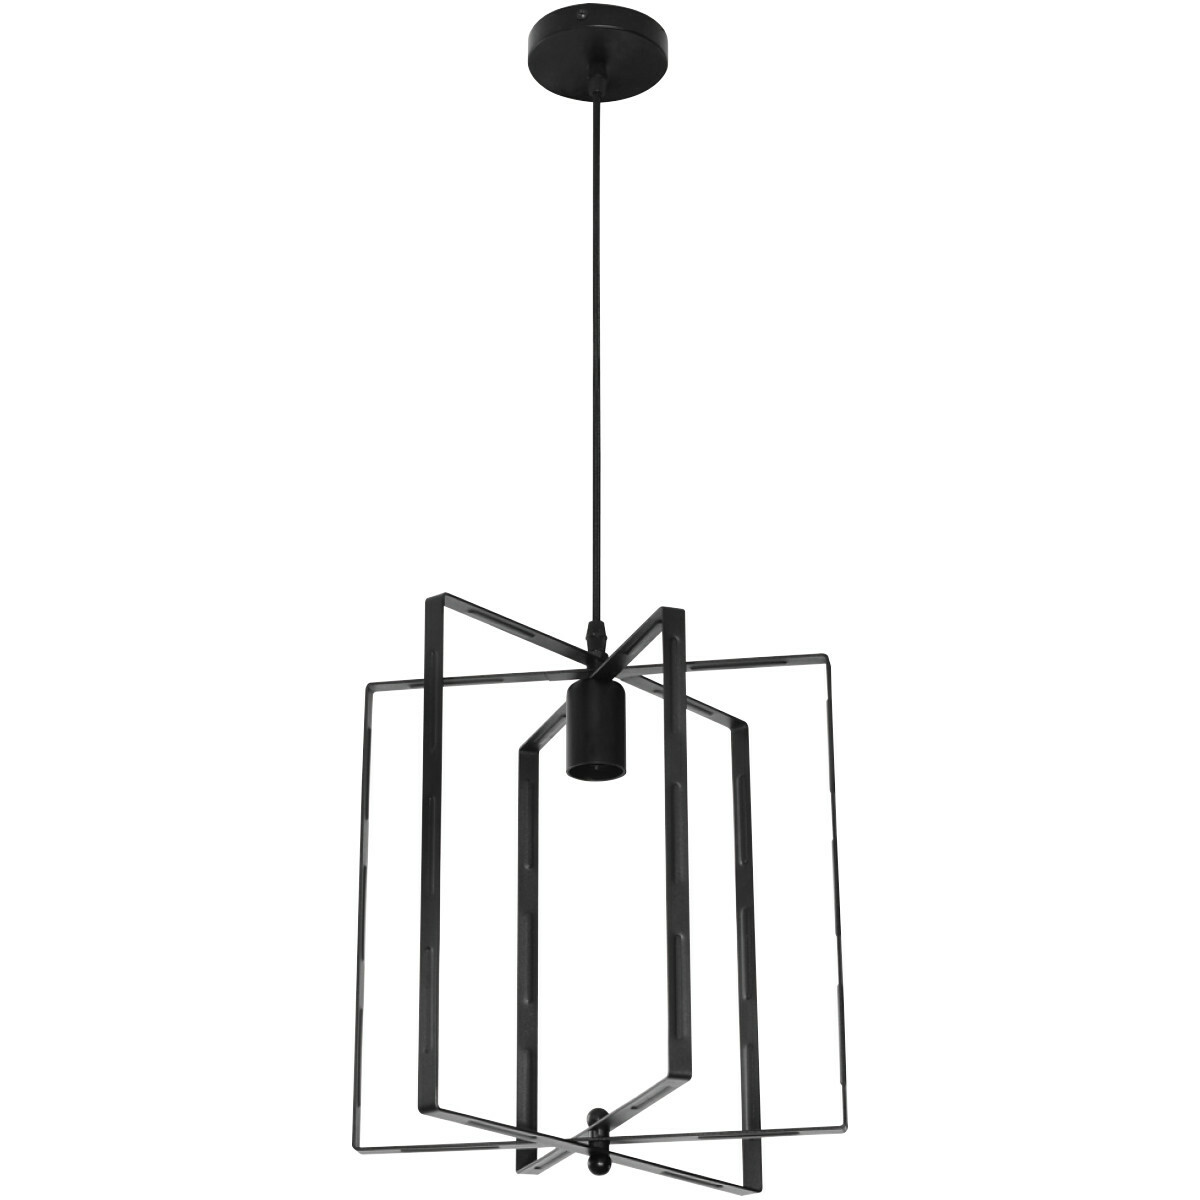 PHILIPS - LED Hanglamp - SceneSwitch 827 A60 - Noby Industrieel - E27 Fitting - Dimbaar - 2W-8W - Wa